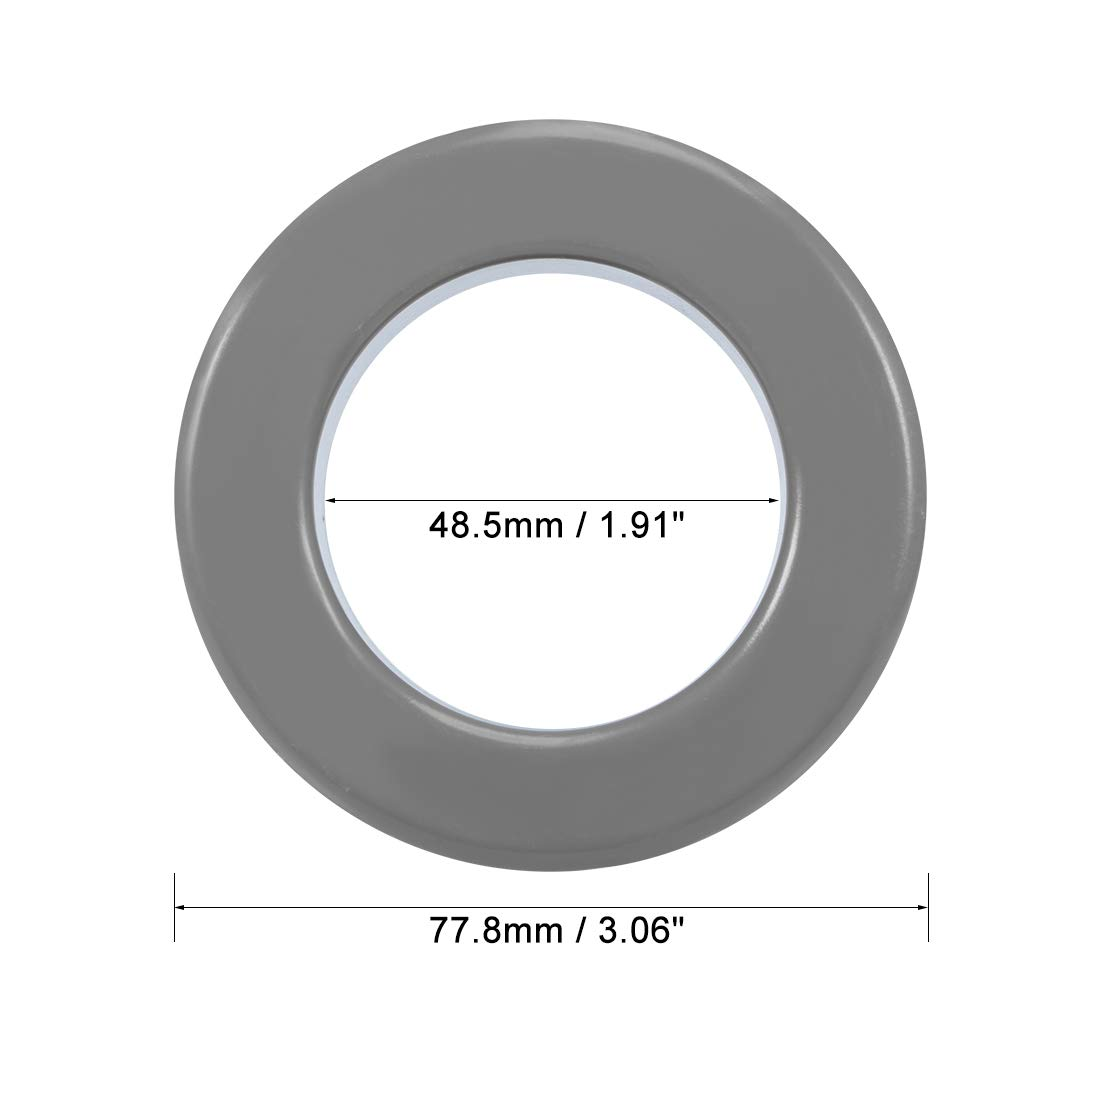 23.5 x 47.3 x 18.5mm Black Ferrite Chokes Ring Iron Powder Inductor Ferrite Rings uxcell Toroid Core